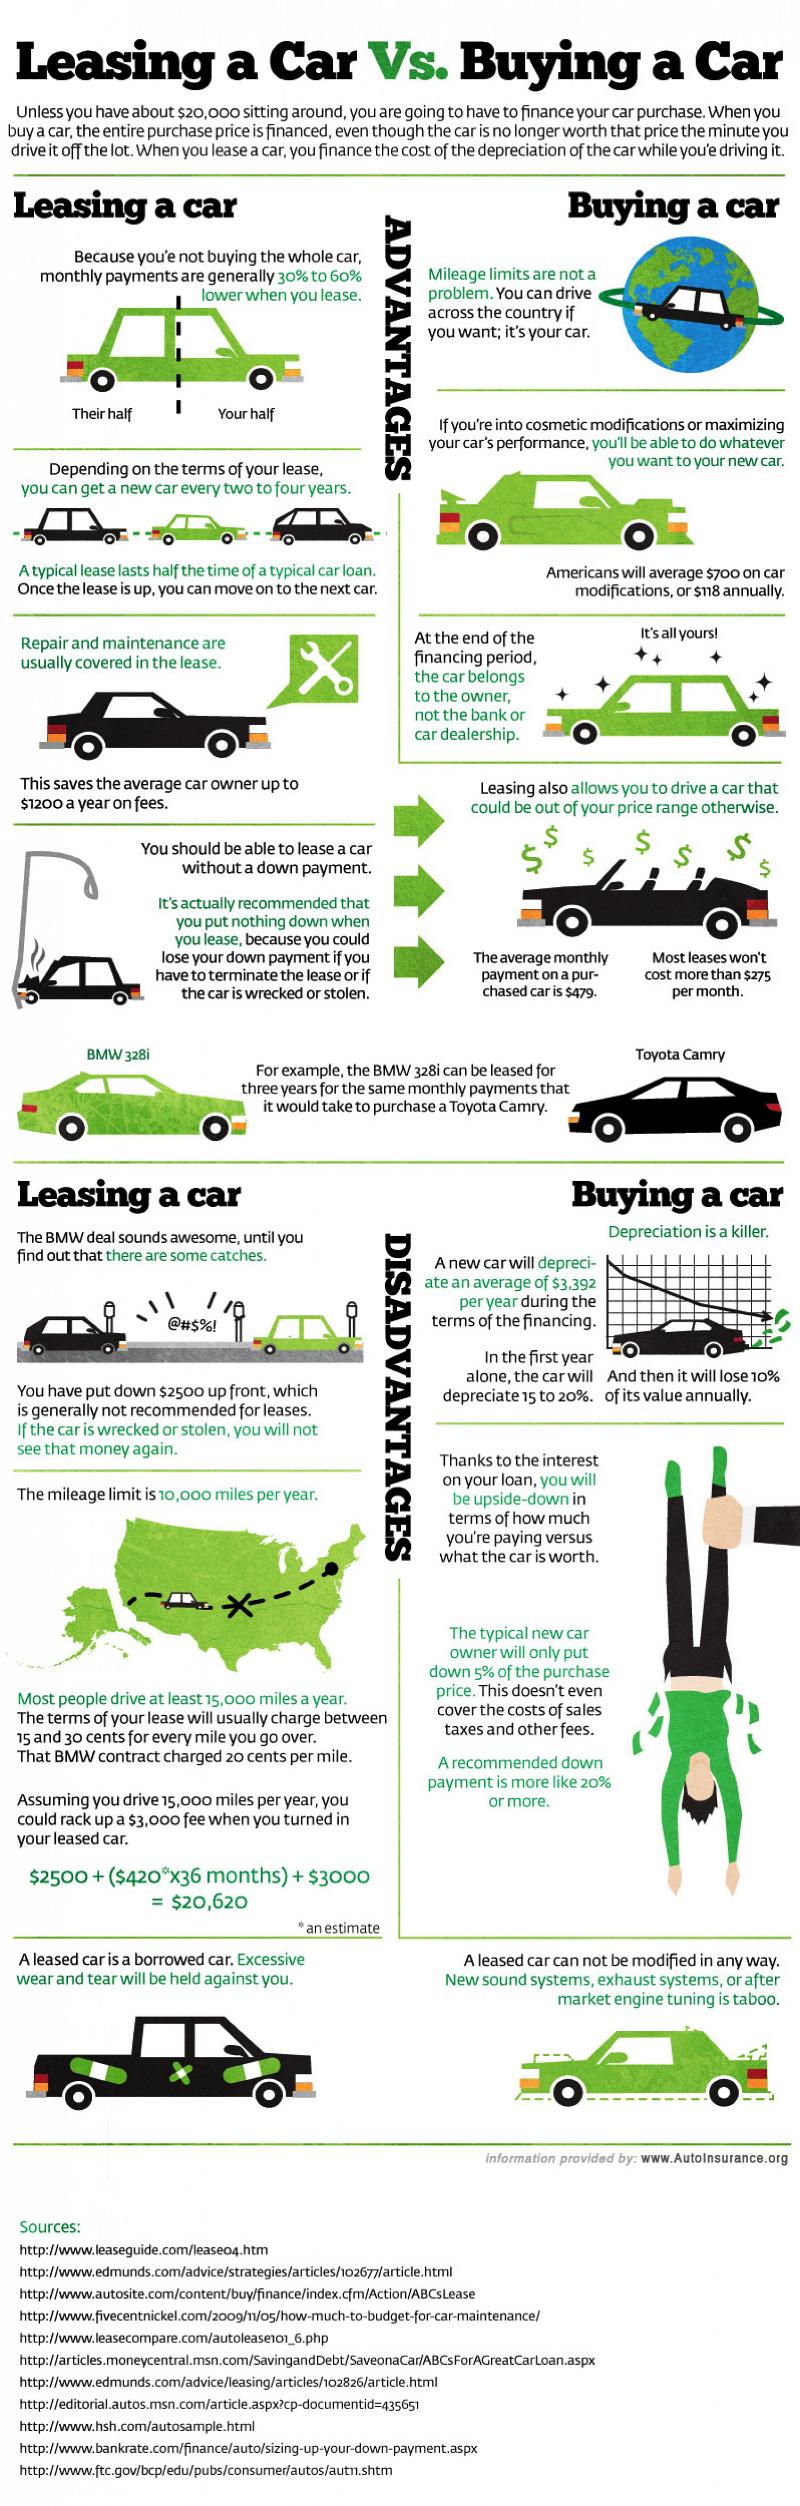 lease vs buy a new car